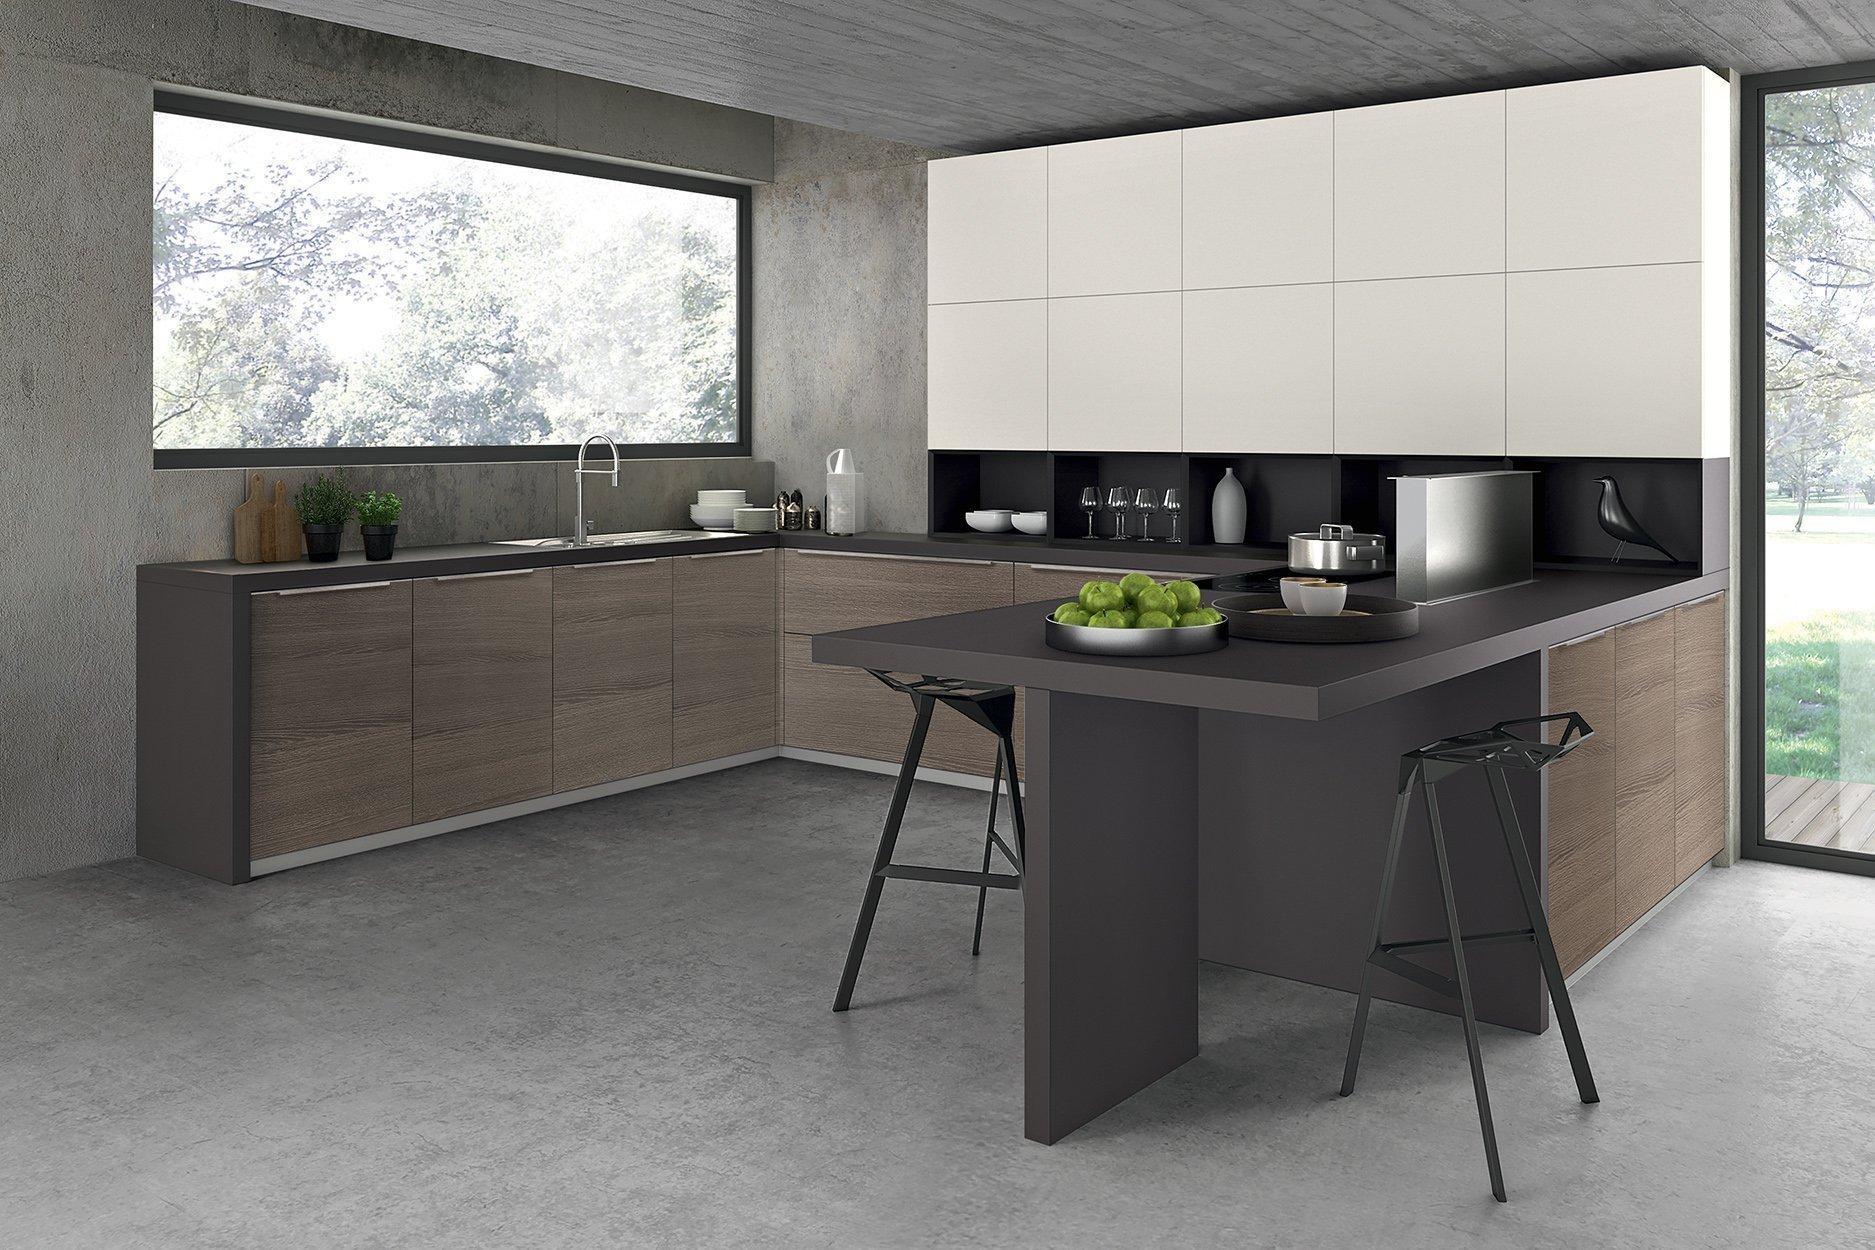 Kitchen Woodgrain Finish With Matt White Combination